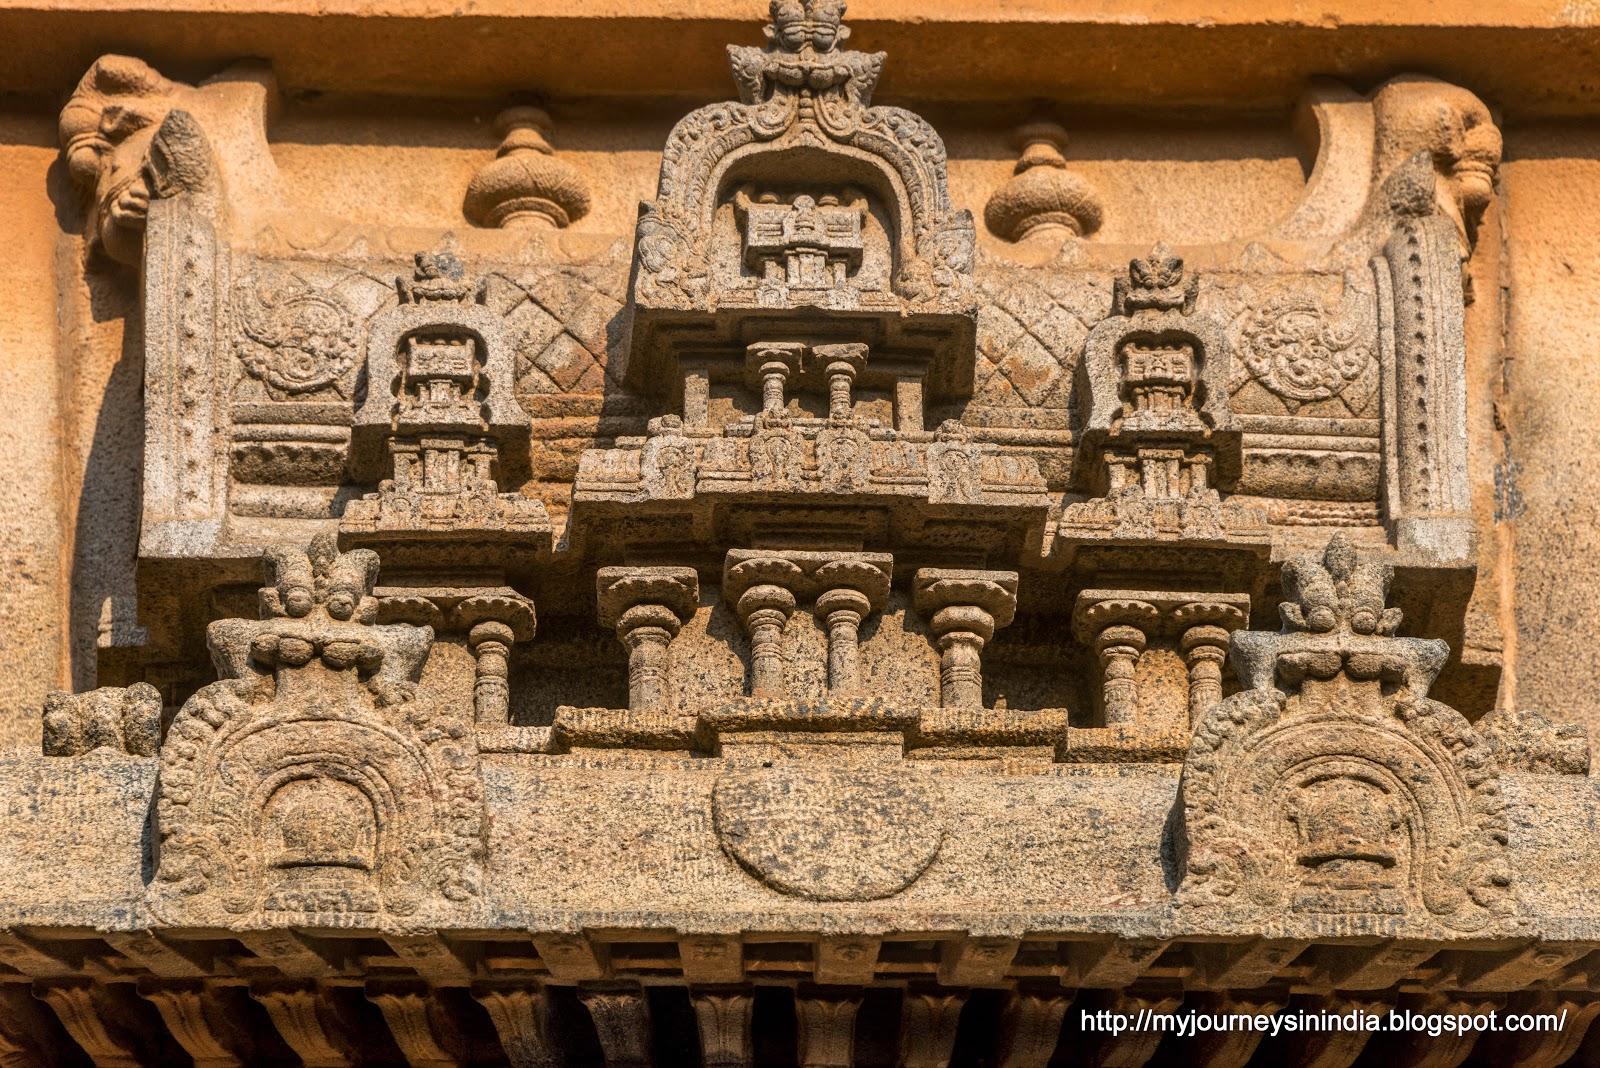 Thanjavur Brihadeeswarar Temple Ganesha Intricate Carvings